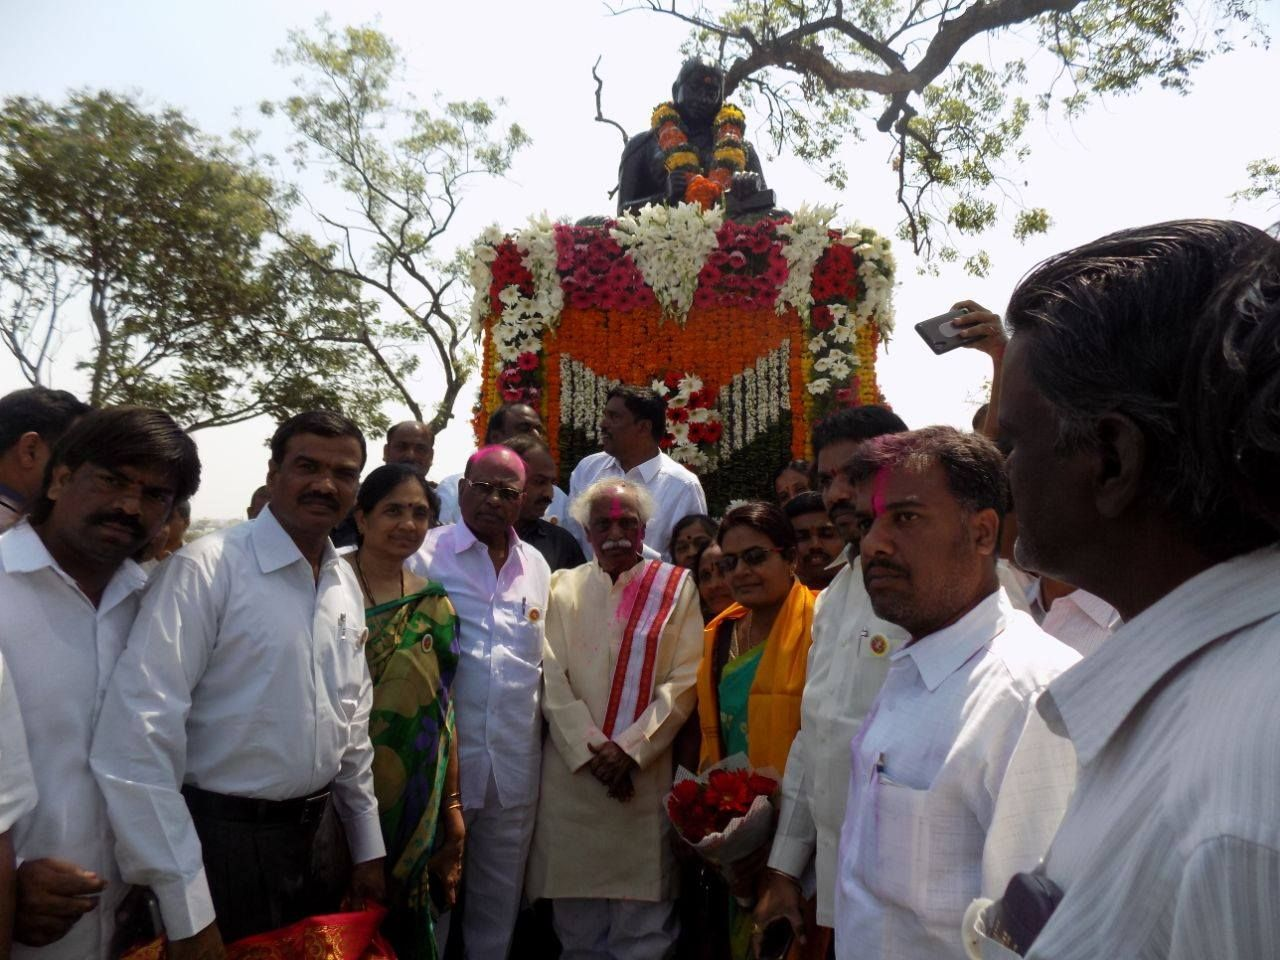 Garlanding Statue of Molla (1440-1530, was a Telugu poet who authored the Telugu-language Ramayana) at Tank Bund,Hyderabad. BJP Telangana